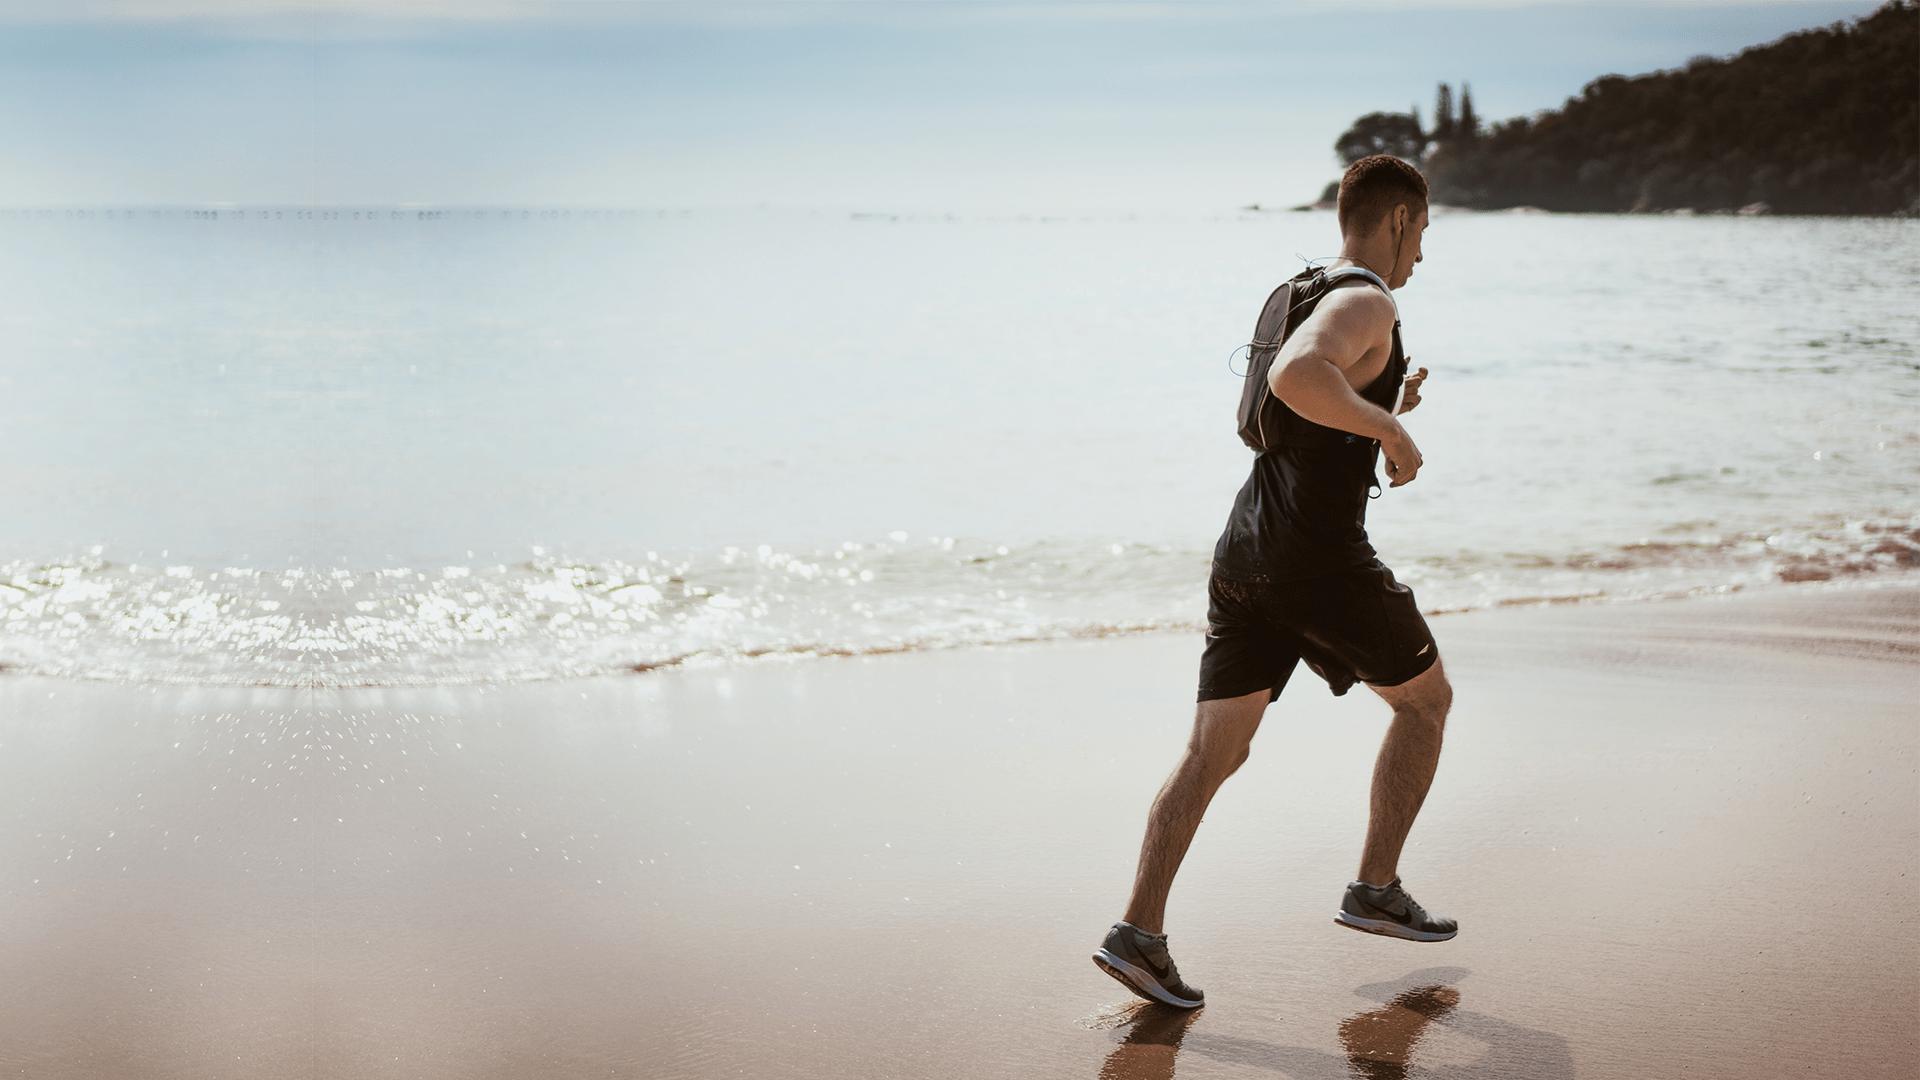 athletic man running on a beach